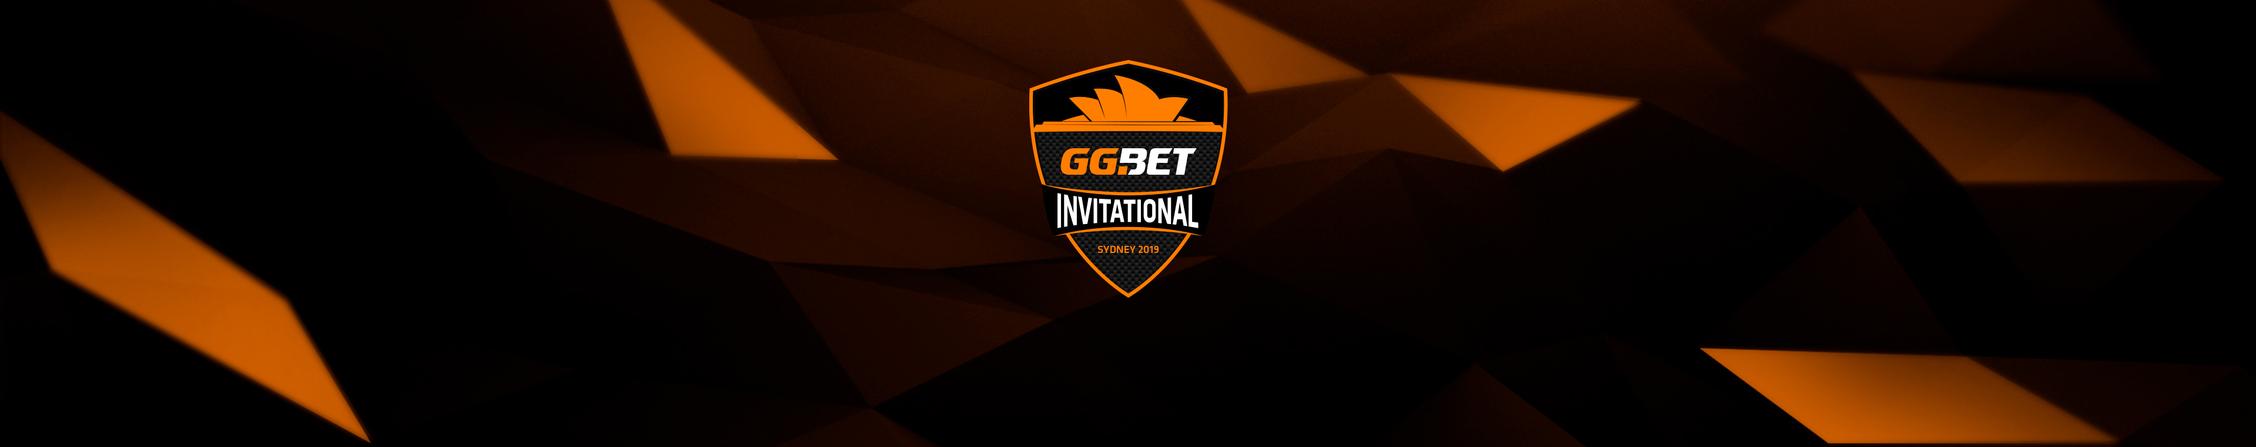 GG.BET Sydney Invitational